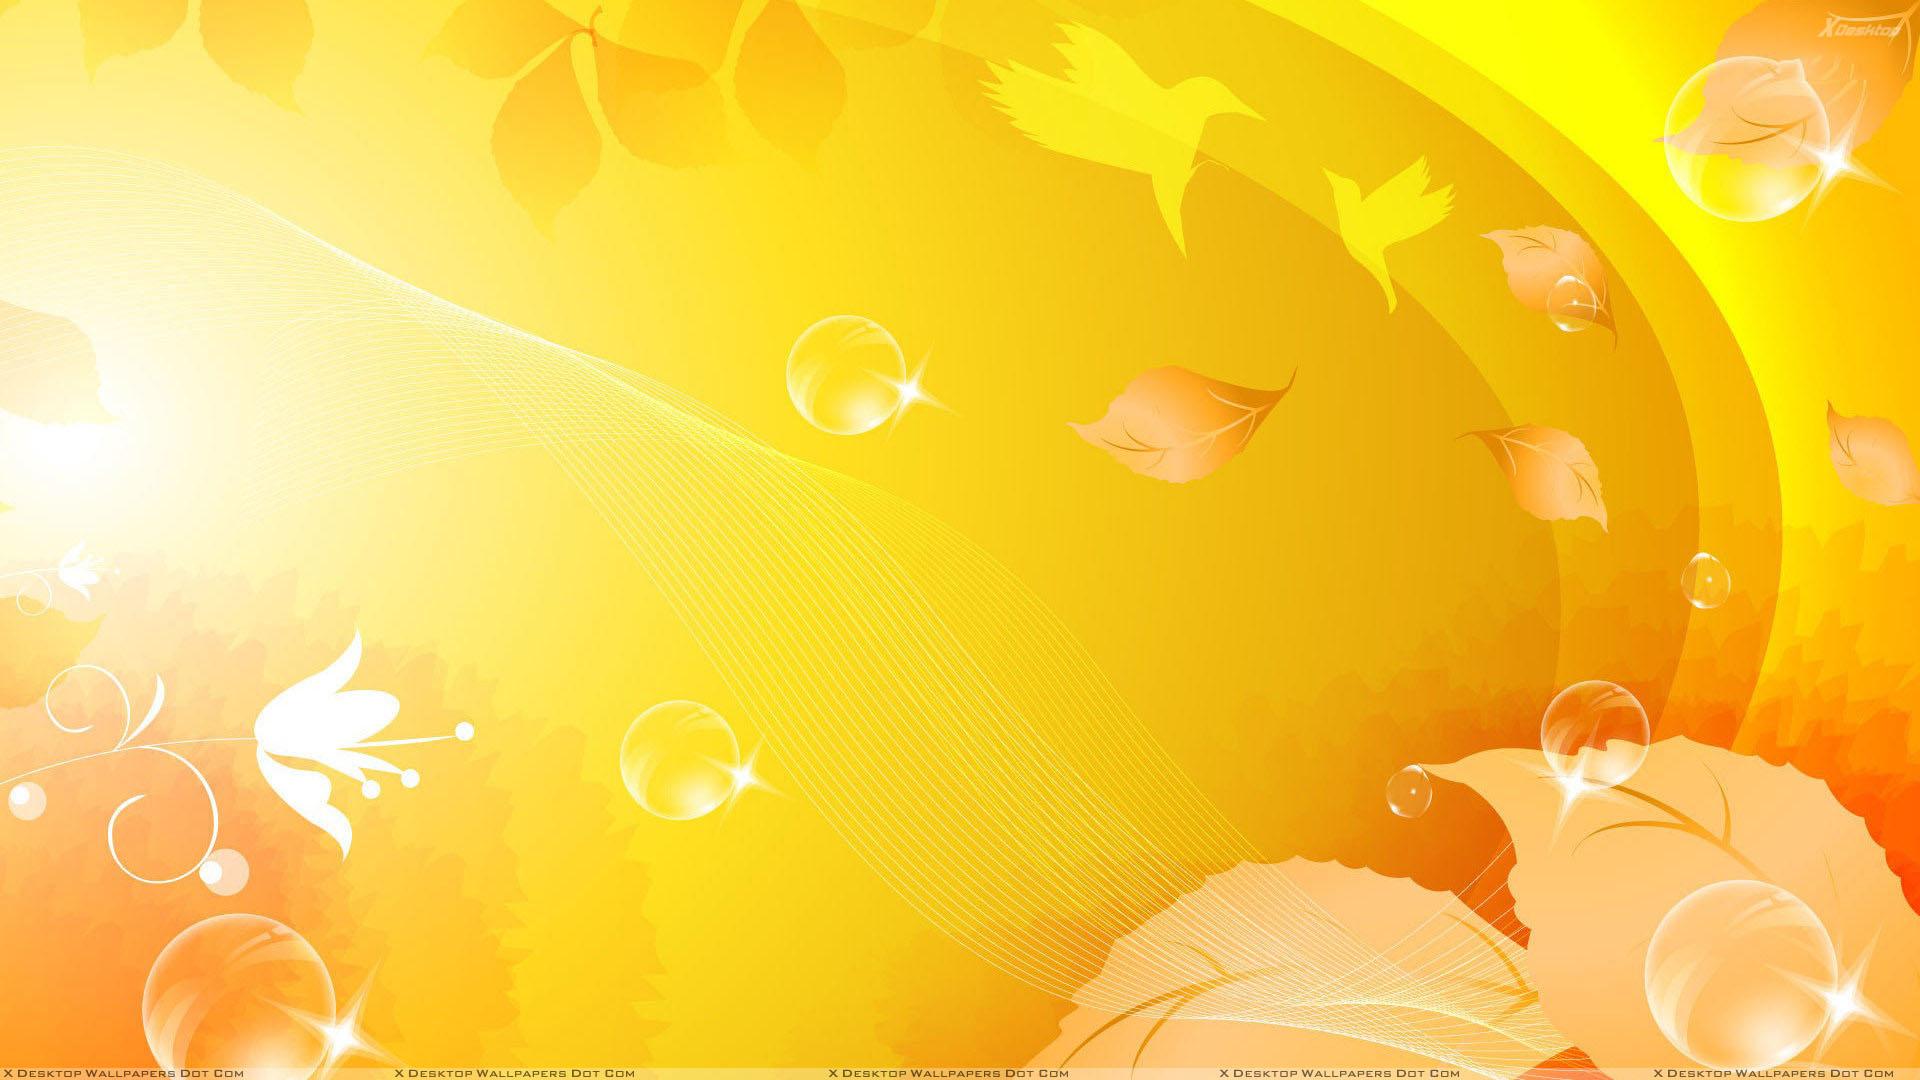 The yellow wallpaper enotes